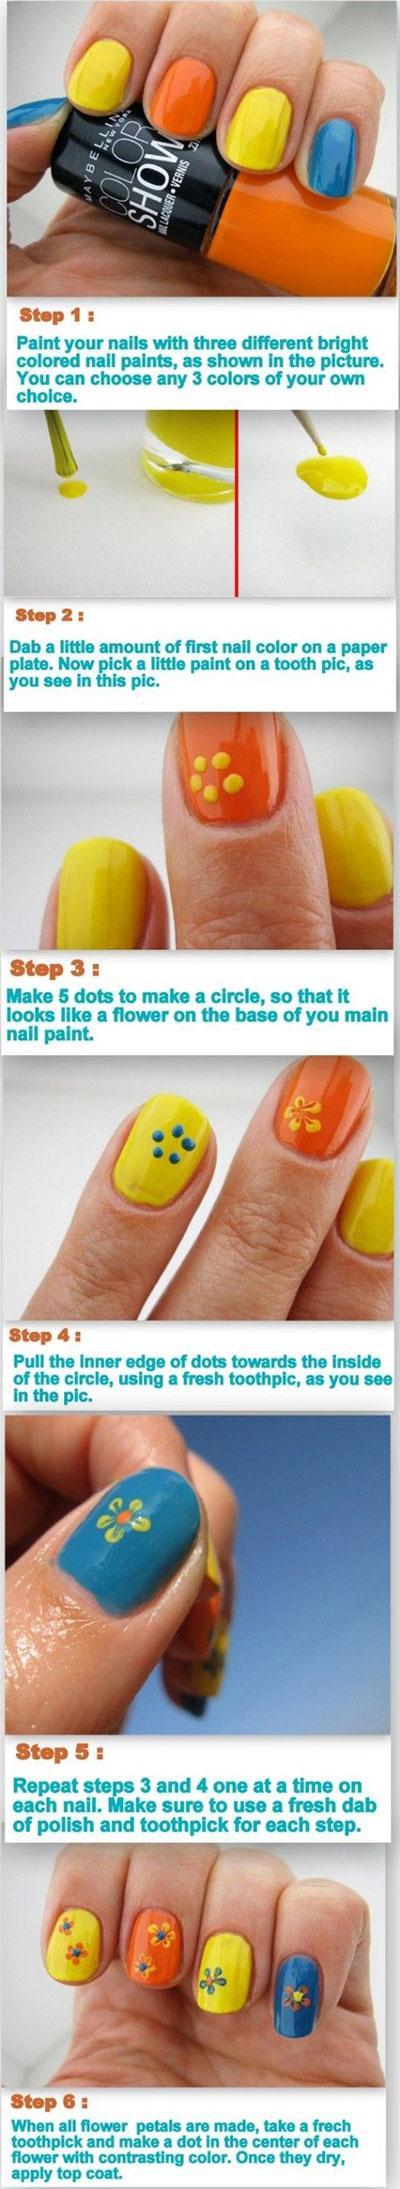 Spring-Summer-Inspired-Nail-Art-Tutorials-2014-For-Beginners-7